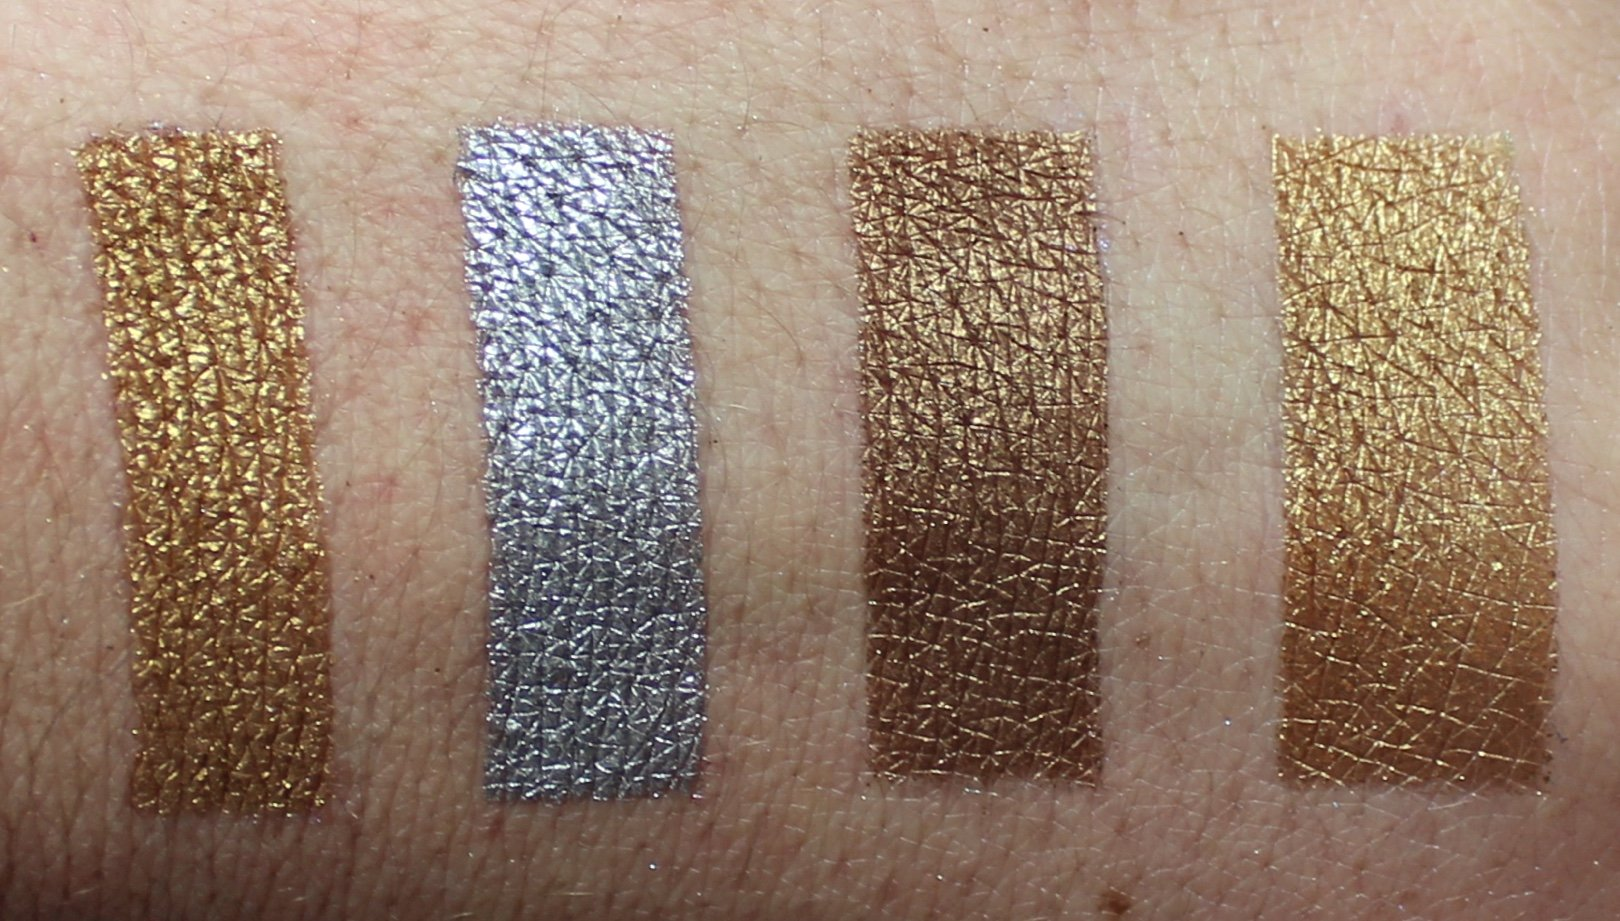 Urban Decay Heavy Metals Metallic Eyeshadow Palette swatches